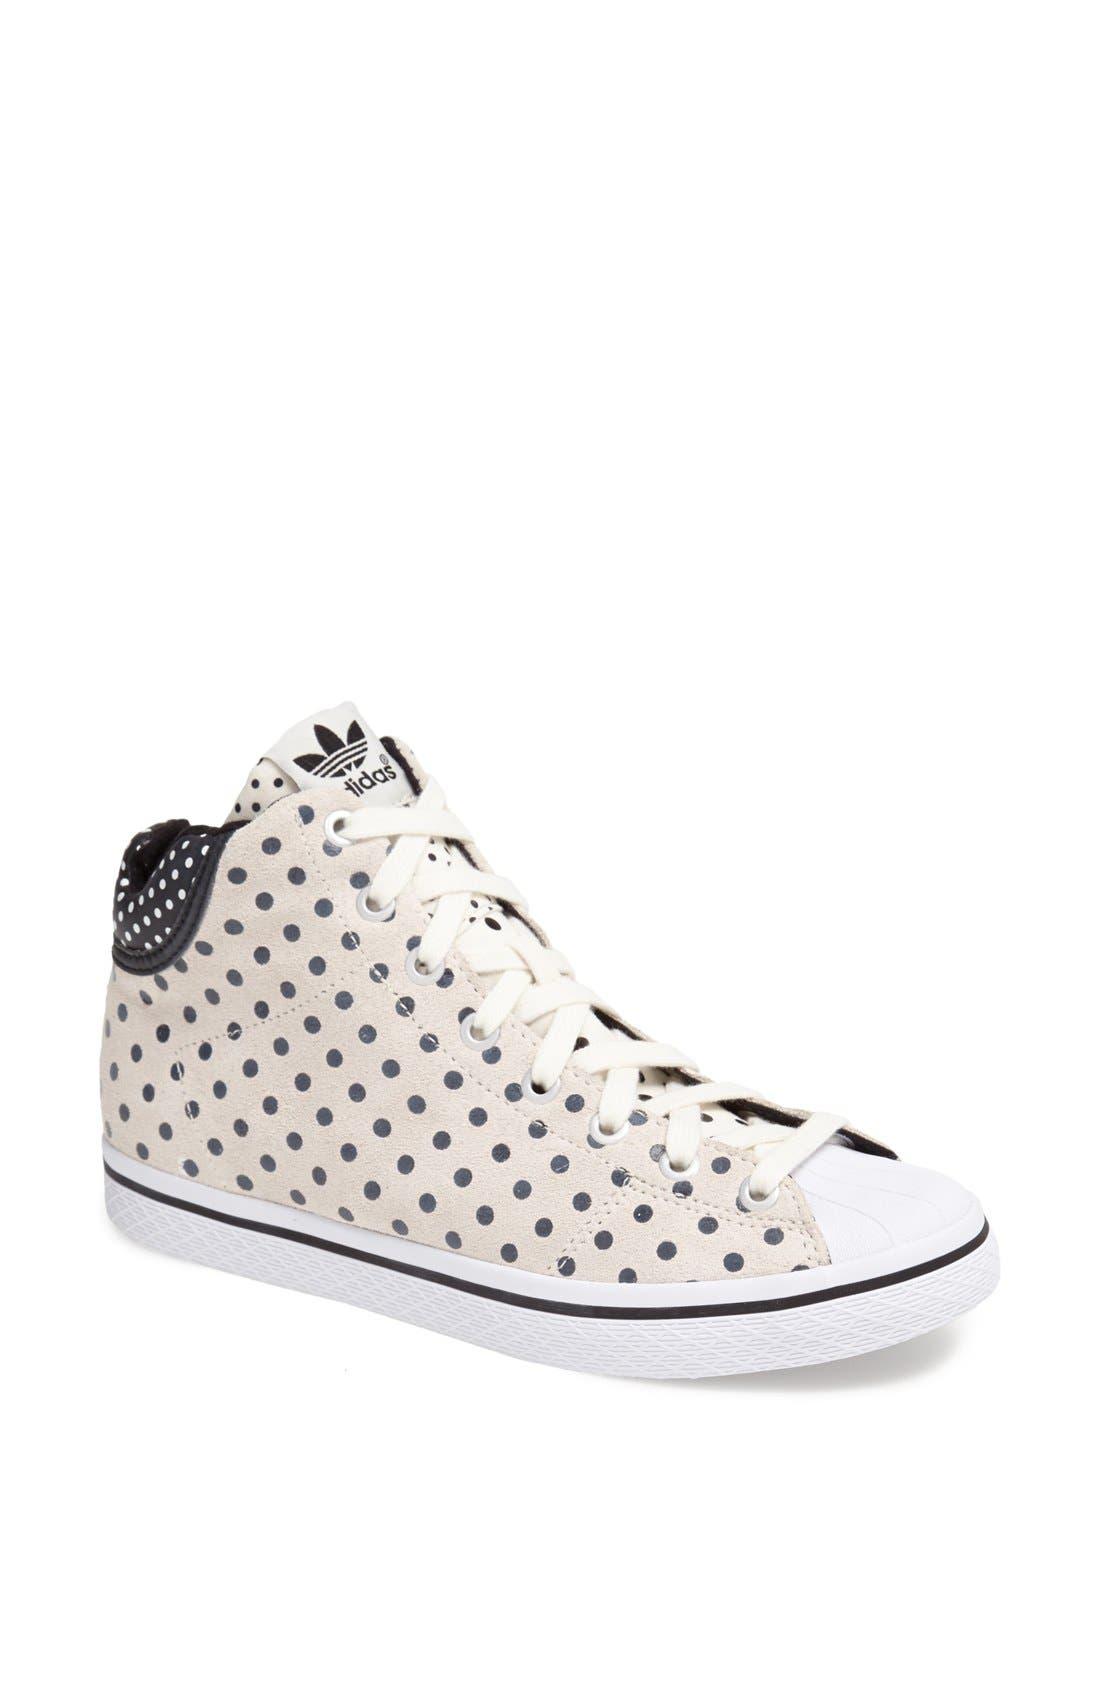 Alternate Image 1 Selected - adidas 'Star' High Top Sneaker (Women)